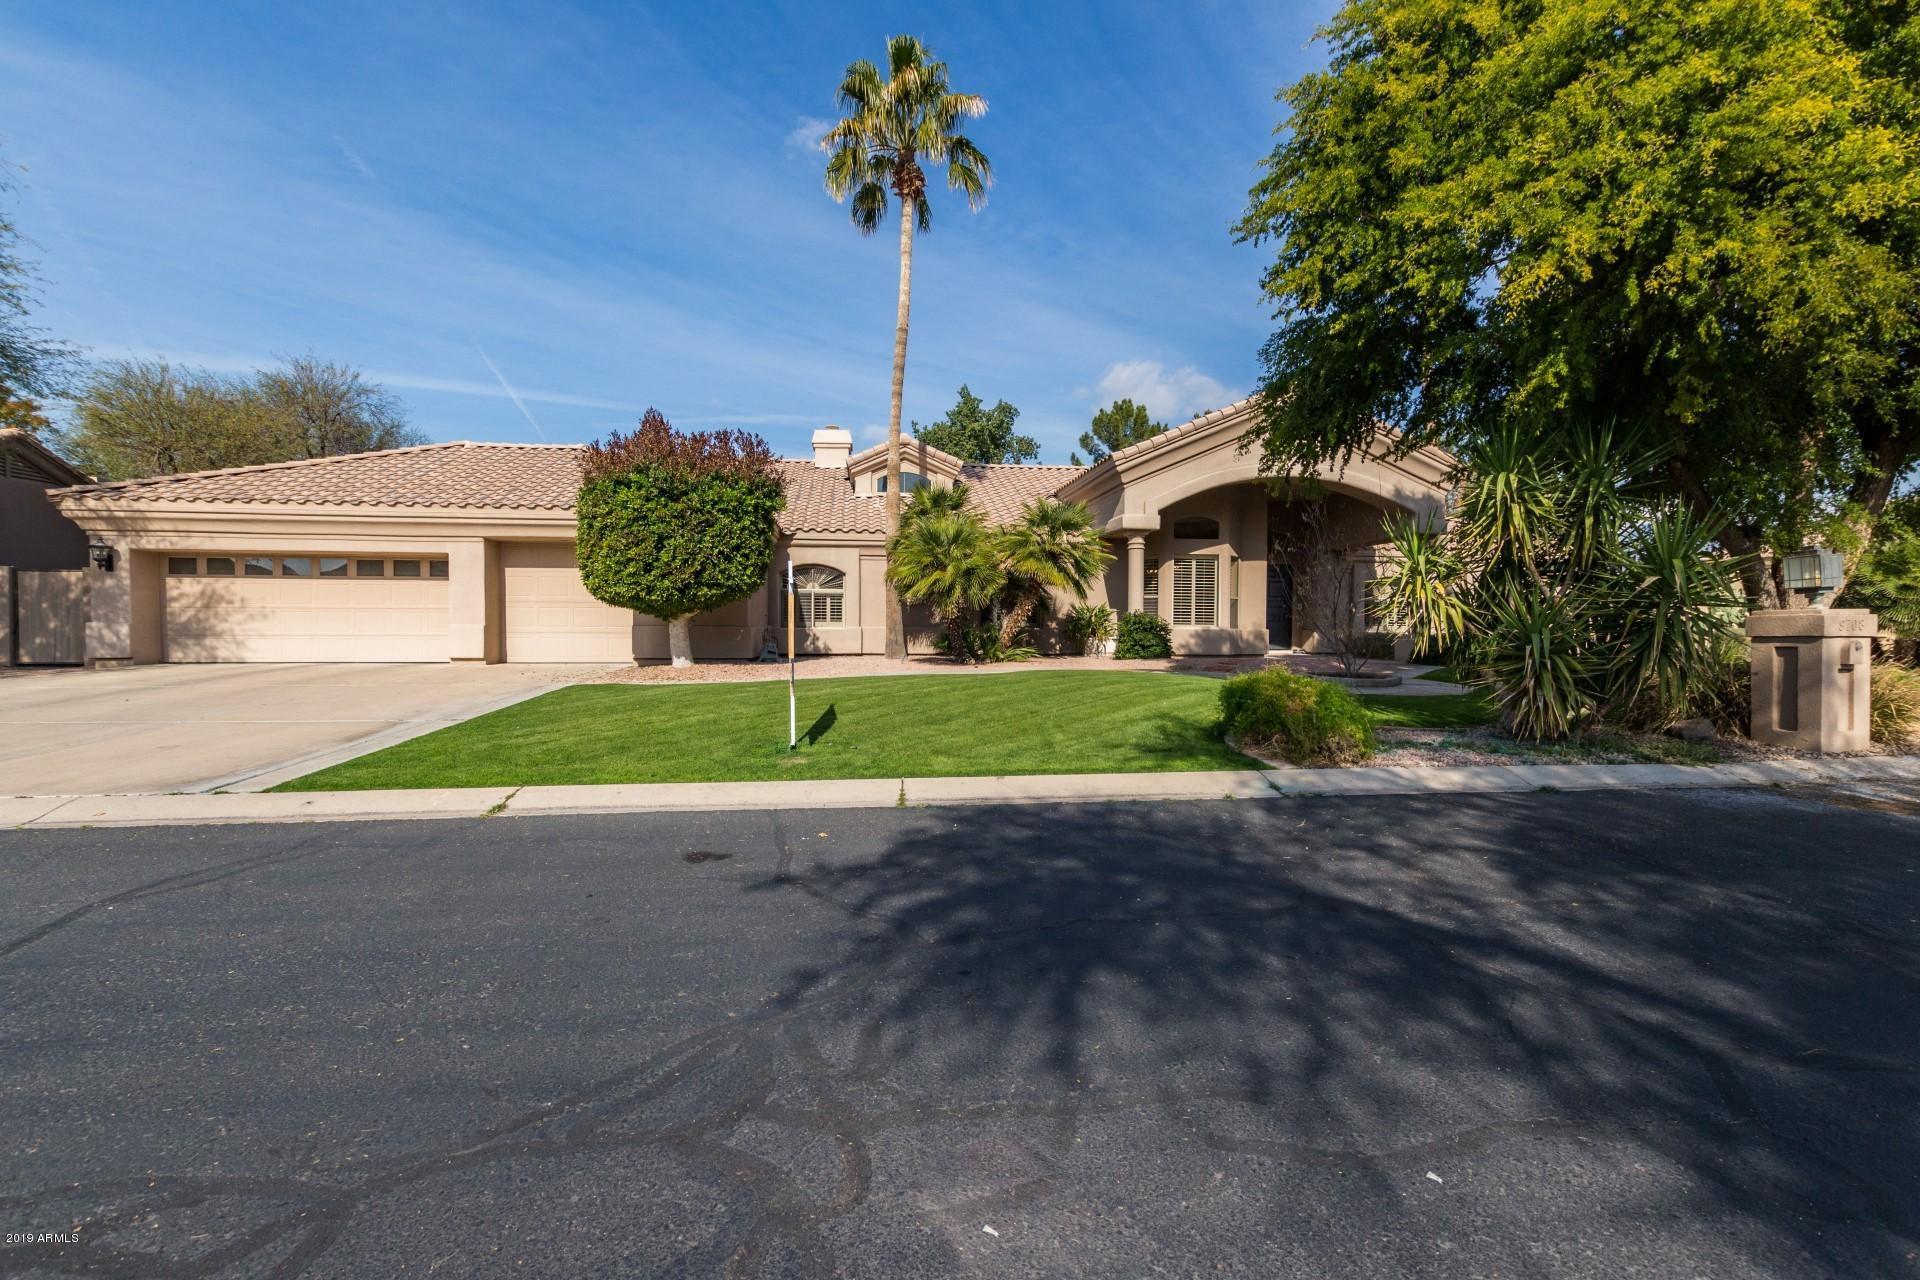 9708 E LAUREL Lane, Scottsdale AZ 85260